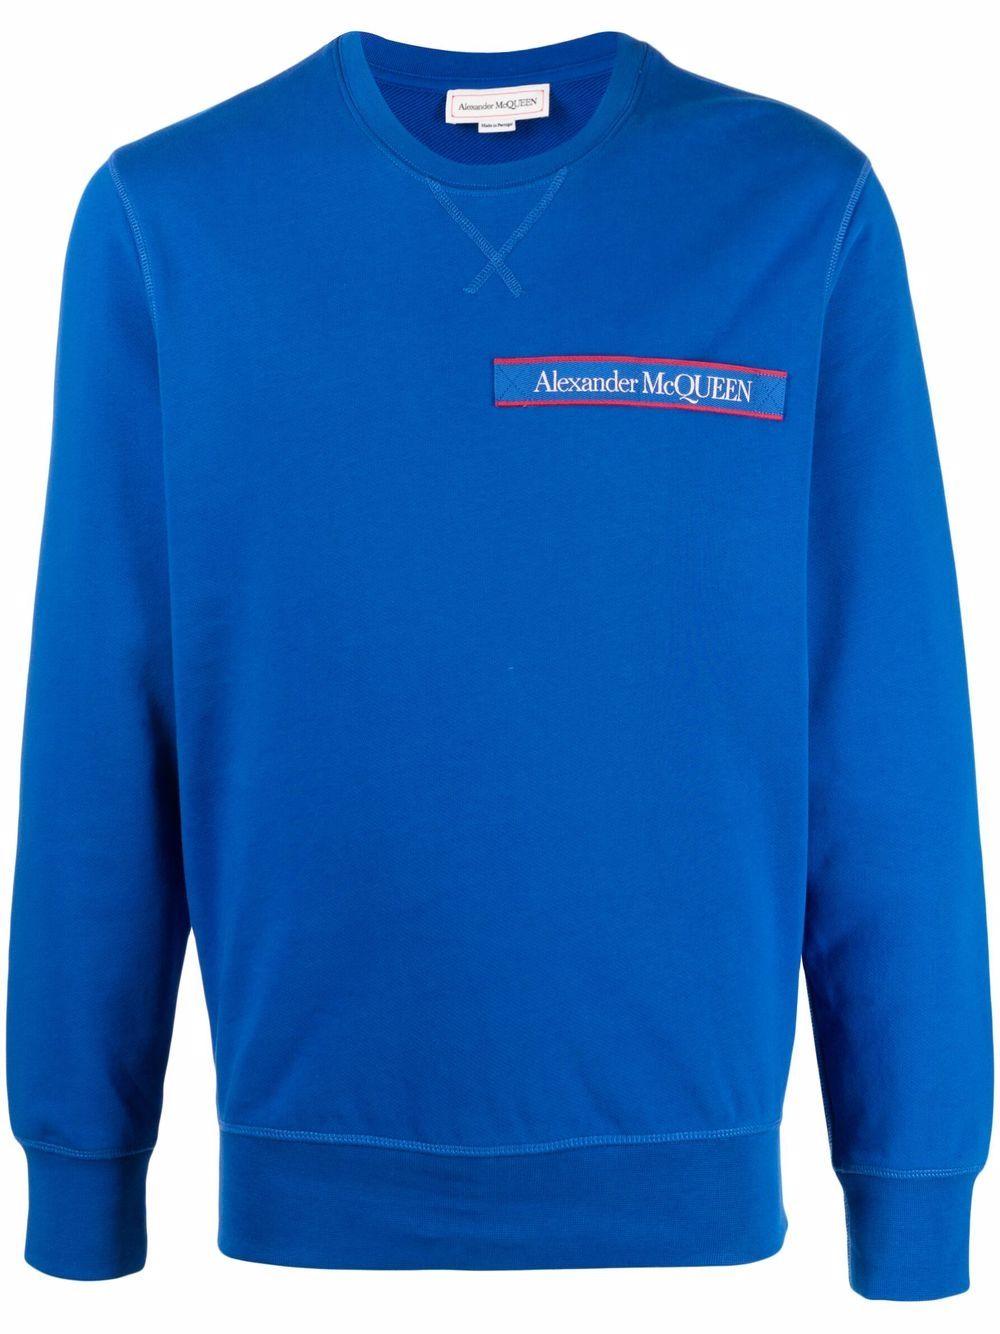 Alexander McQueen logo-patch sweatshirt - Blau